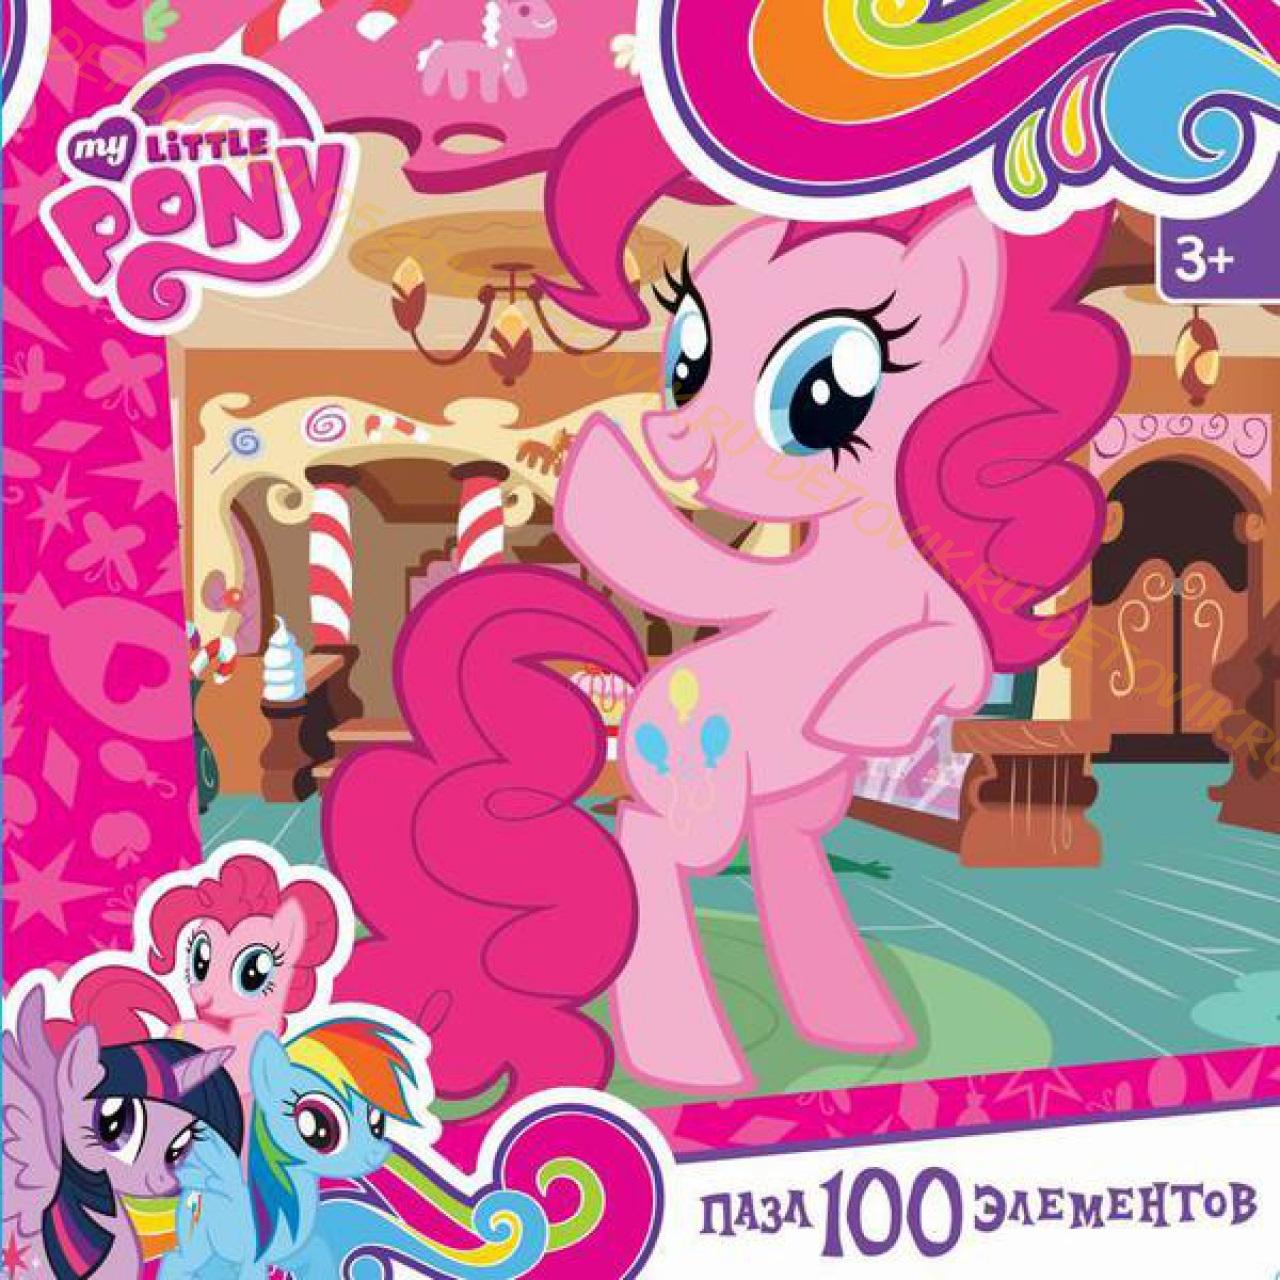 Пазл 100 Оrigami 02099 My Little Pony. Пинки Пай